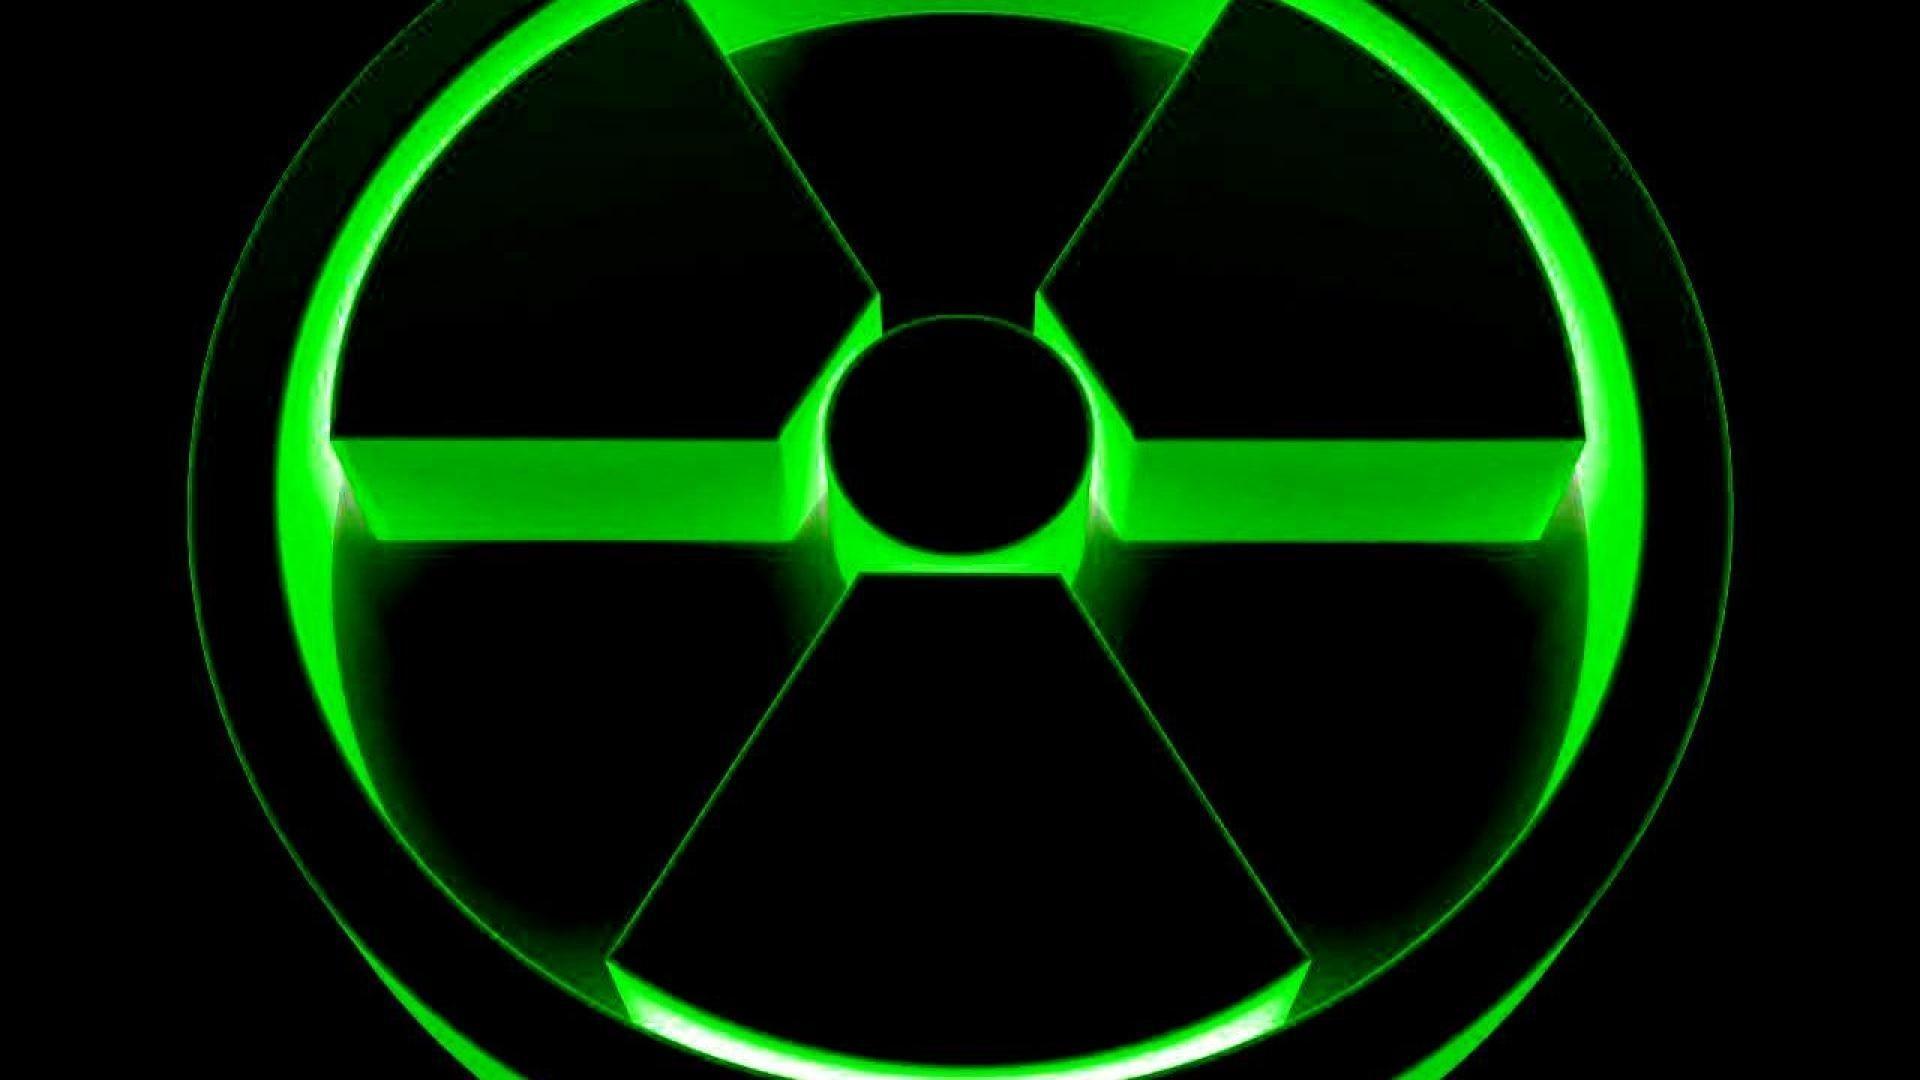 Res: 1920x1080, GREEN RADIOACTIVITY HD WALLPAPER - (#68648) - HD Wallpapers .